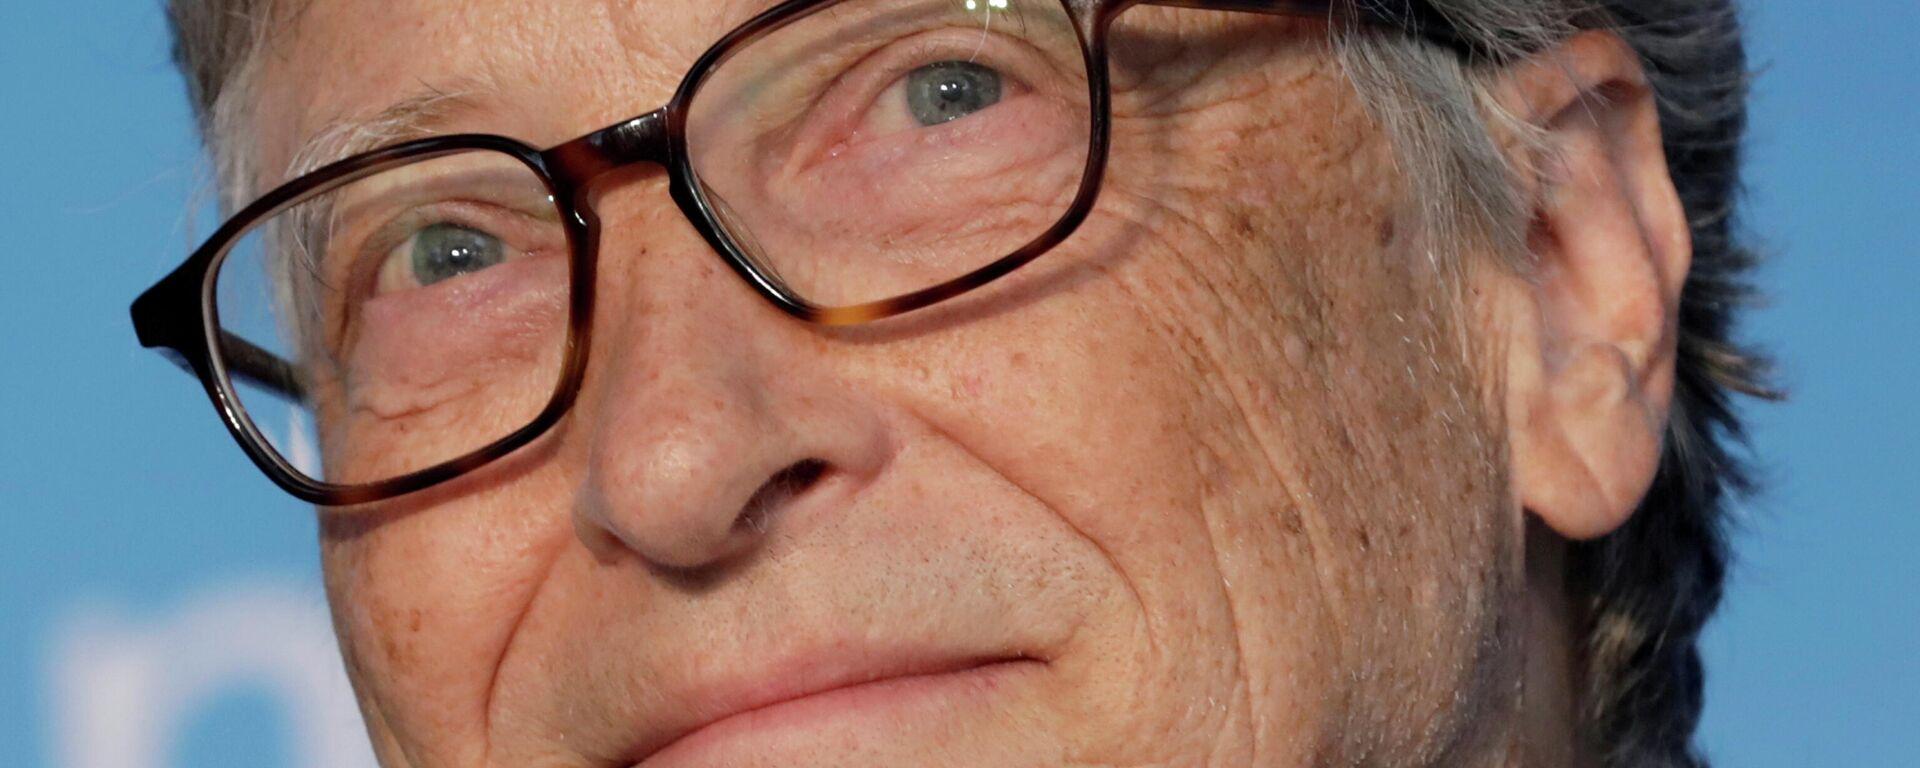 Bill Gates, cofundador de Microsoft - Sputnik Mundo, 1920, 08.06.2021